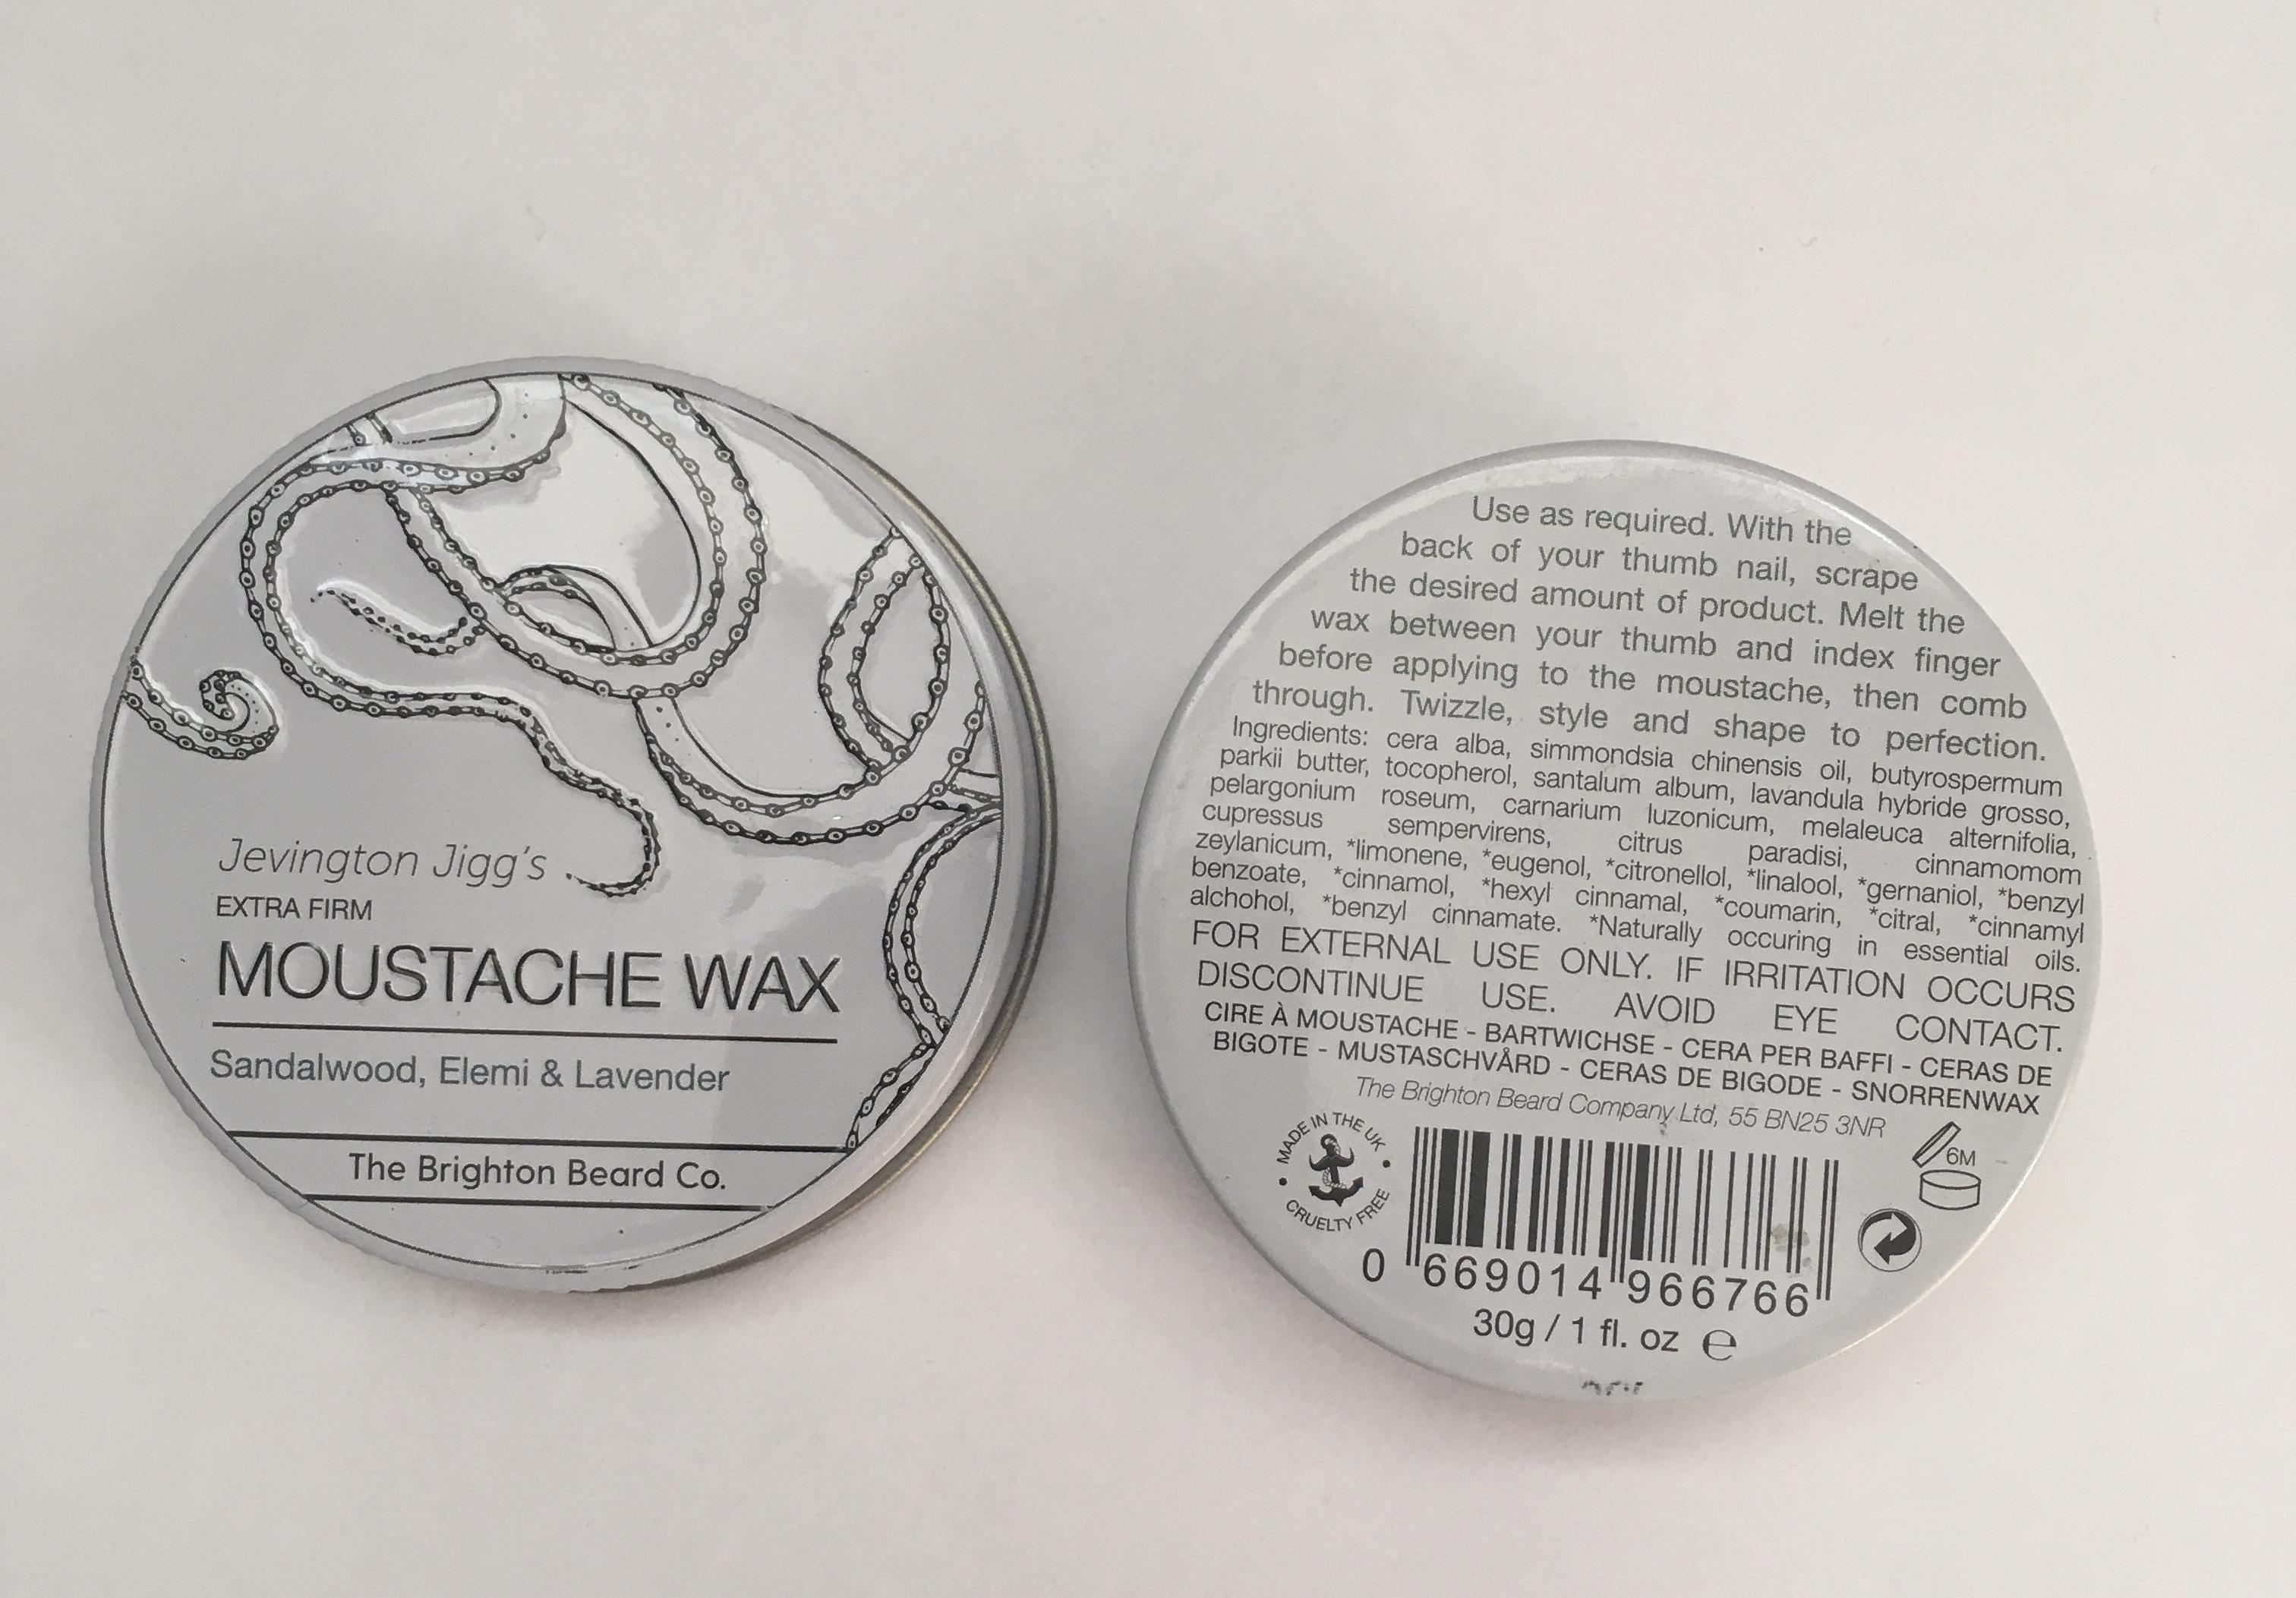 Moustache wax extra firm 30g sandalwood Elemi & lavender